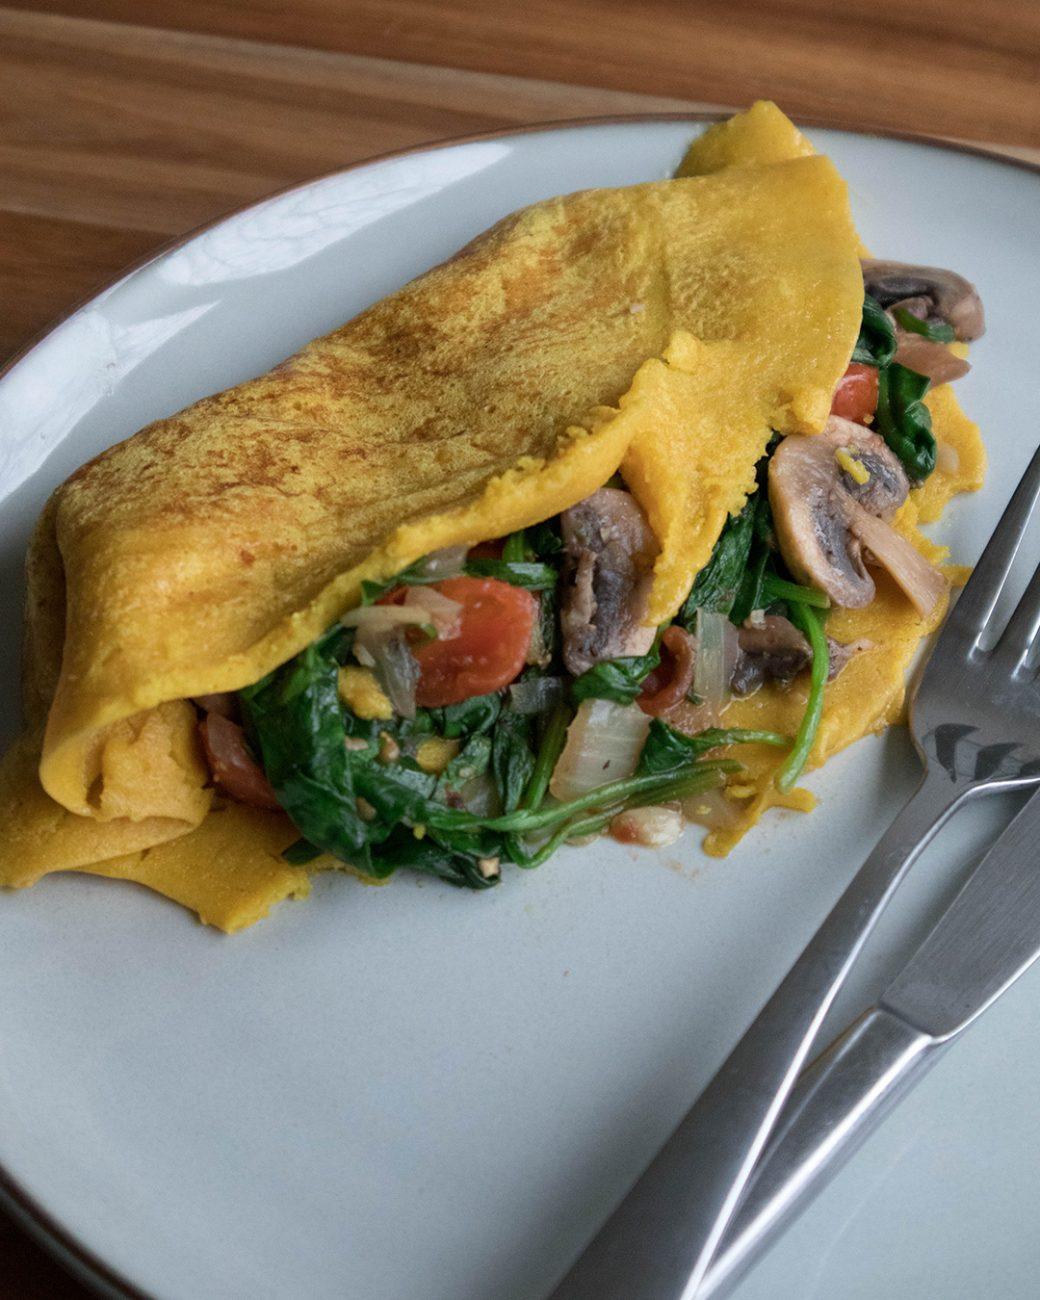 Besan chilla (chickpea omelette)